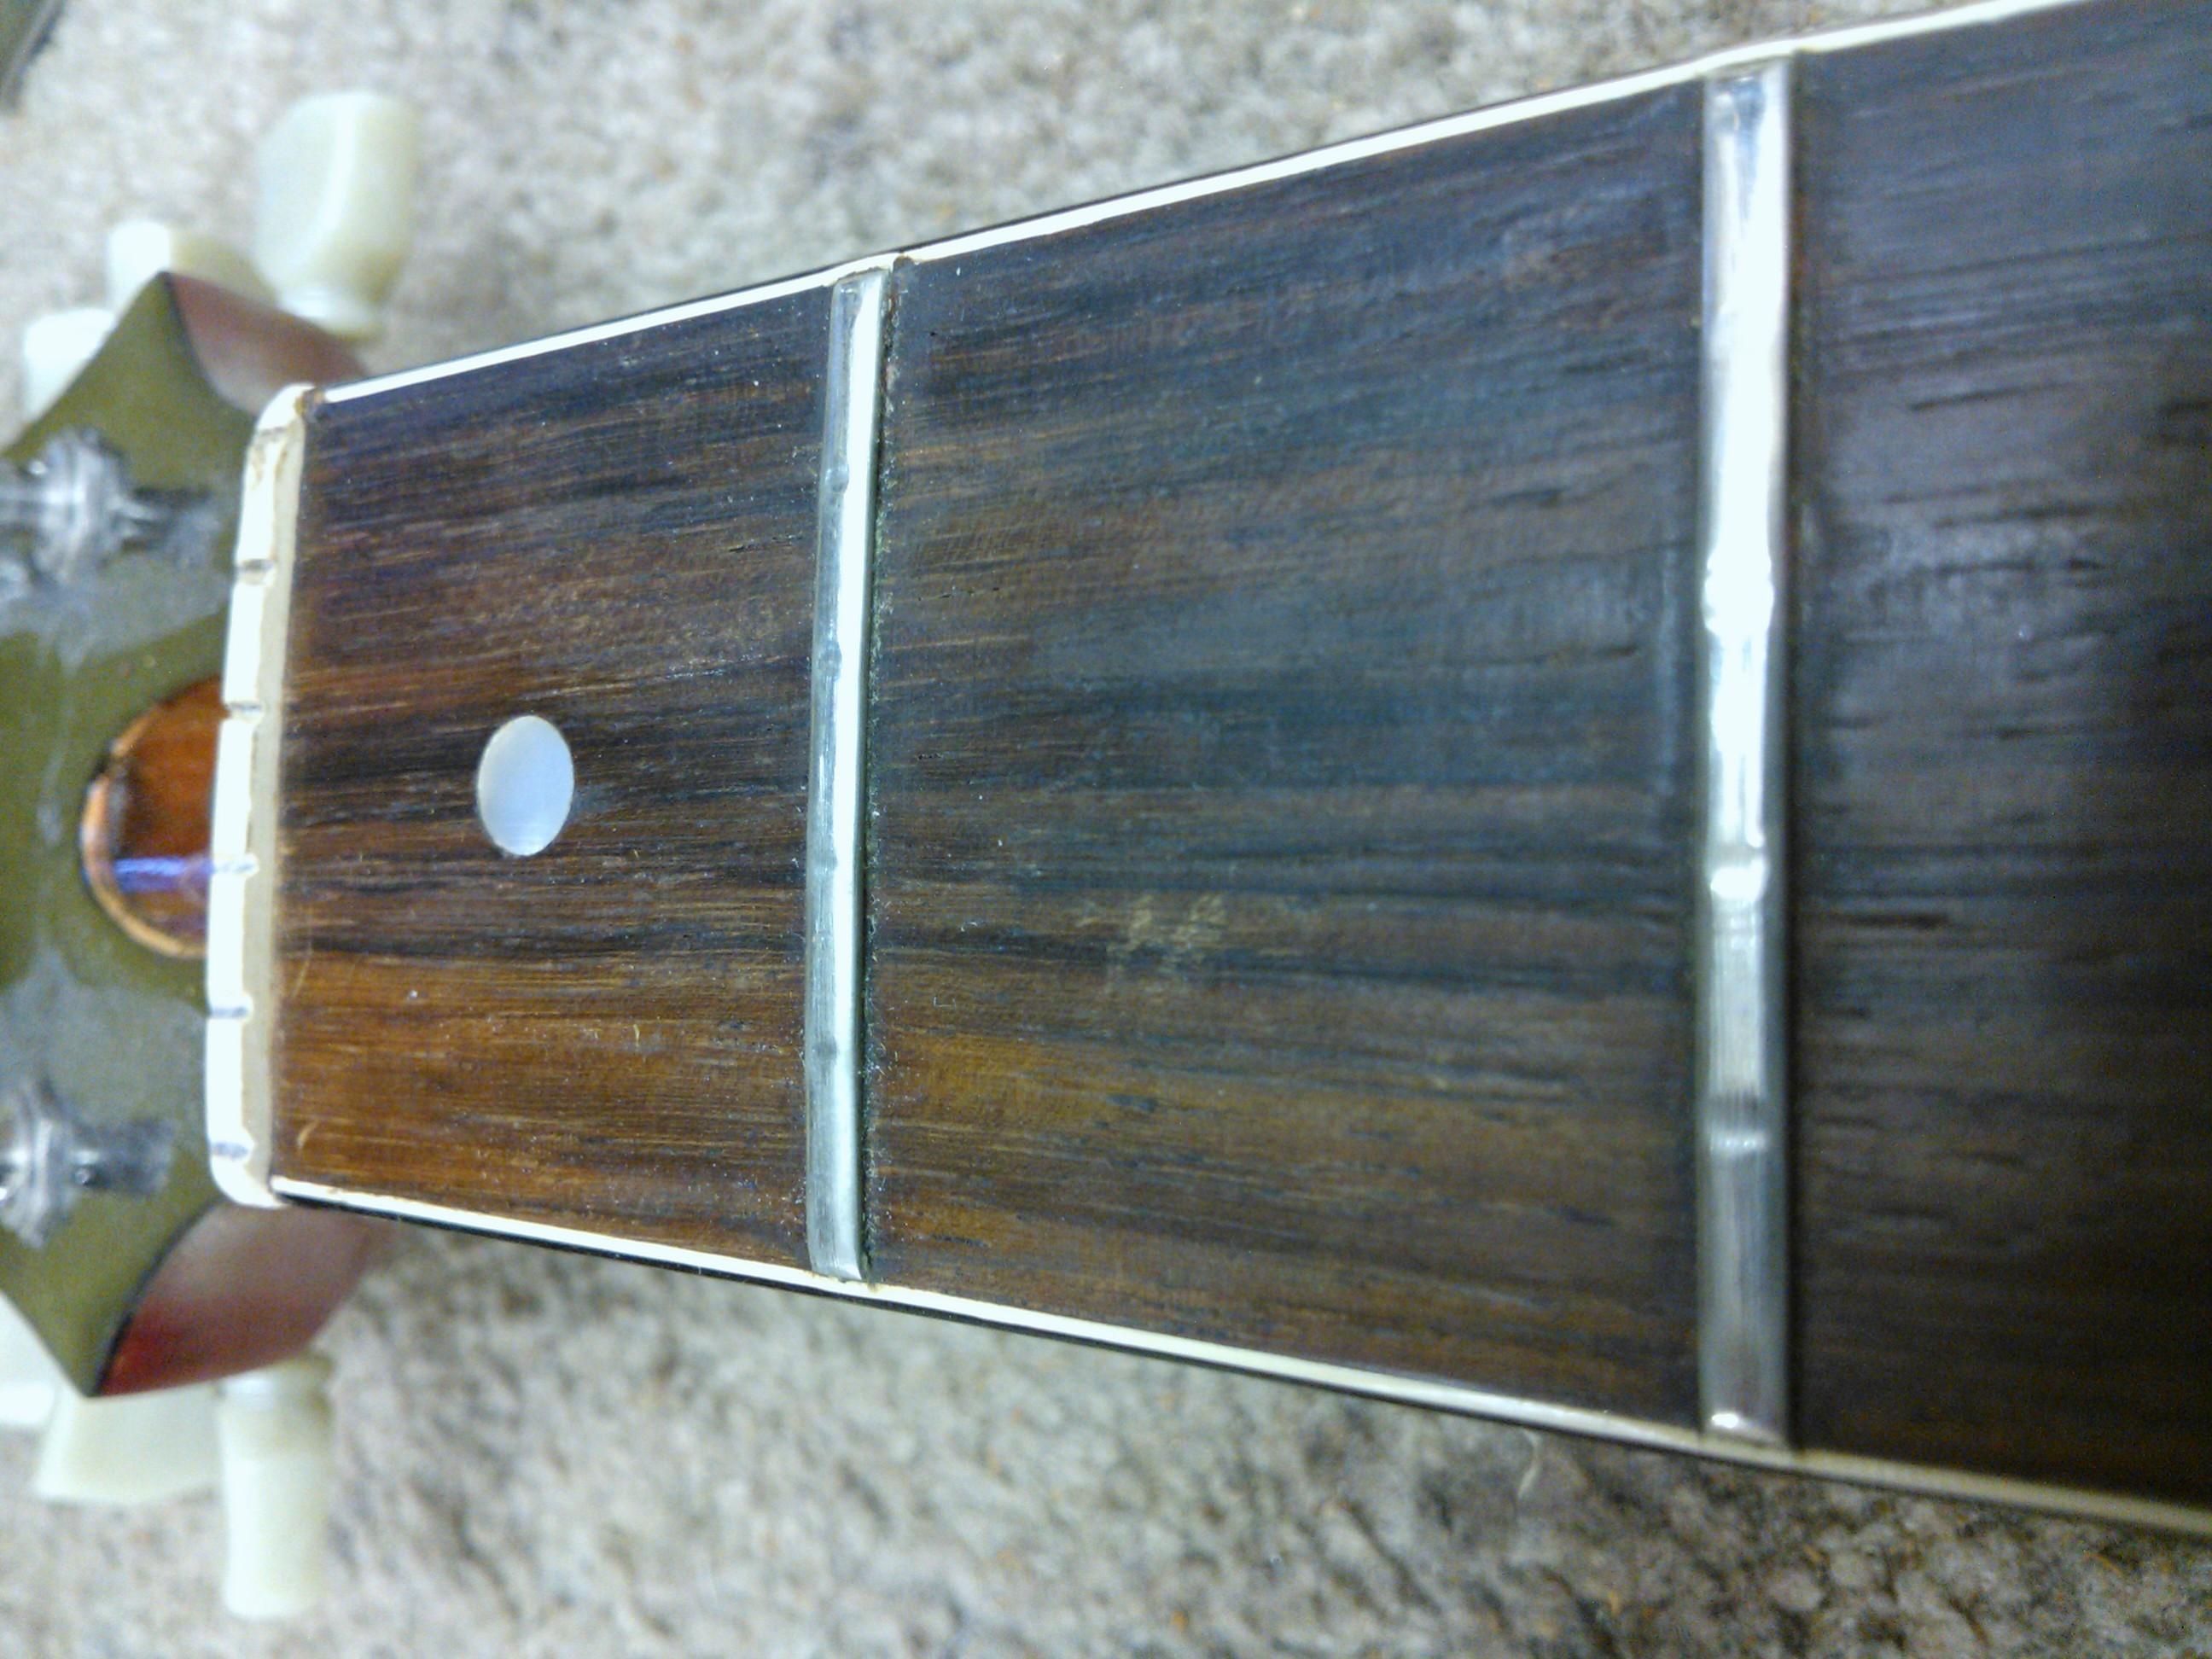 1960's Gibson SG worn frets